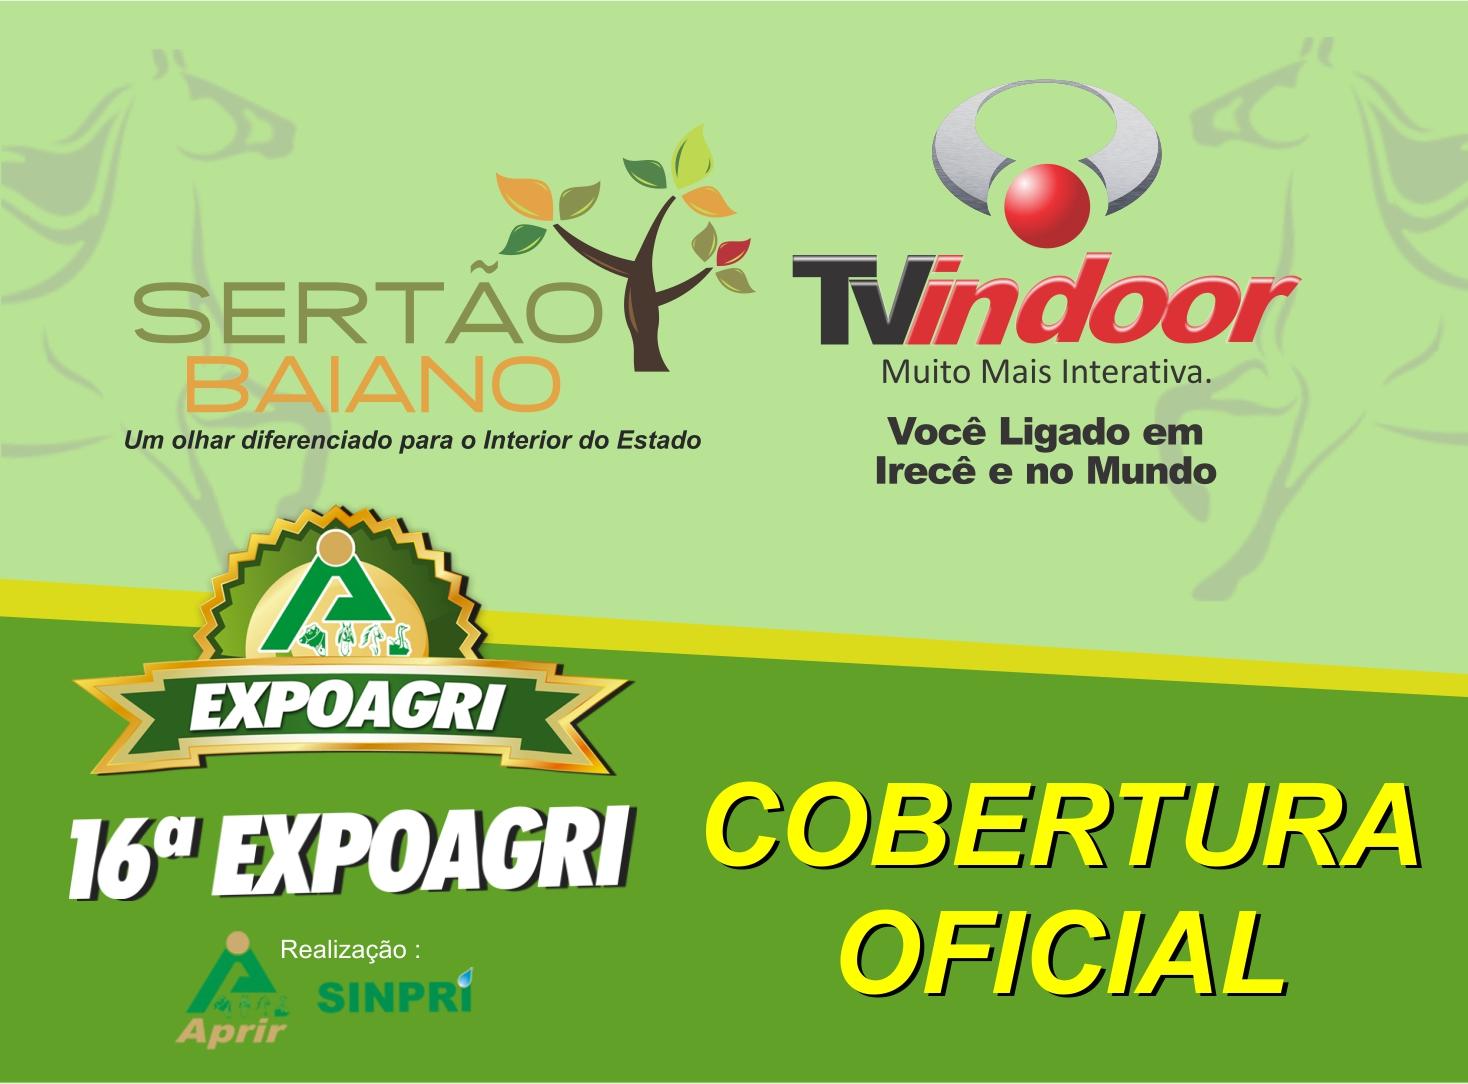 Serto-Baiano-e-Artmdia-na-cobertura-oficial-da-16-EXPOAGRI